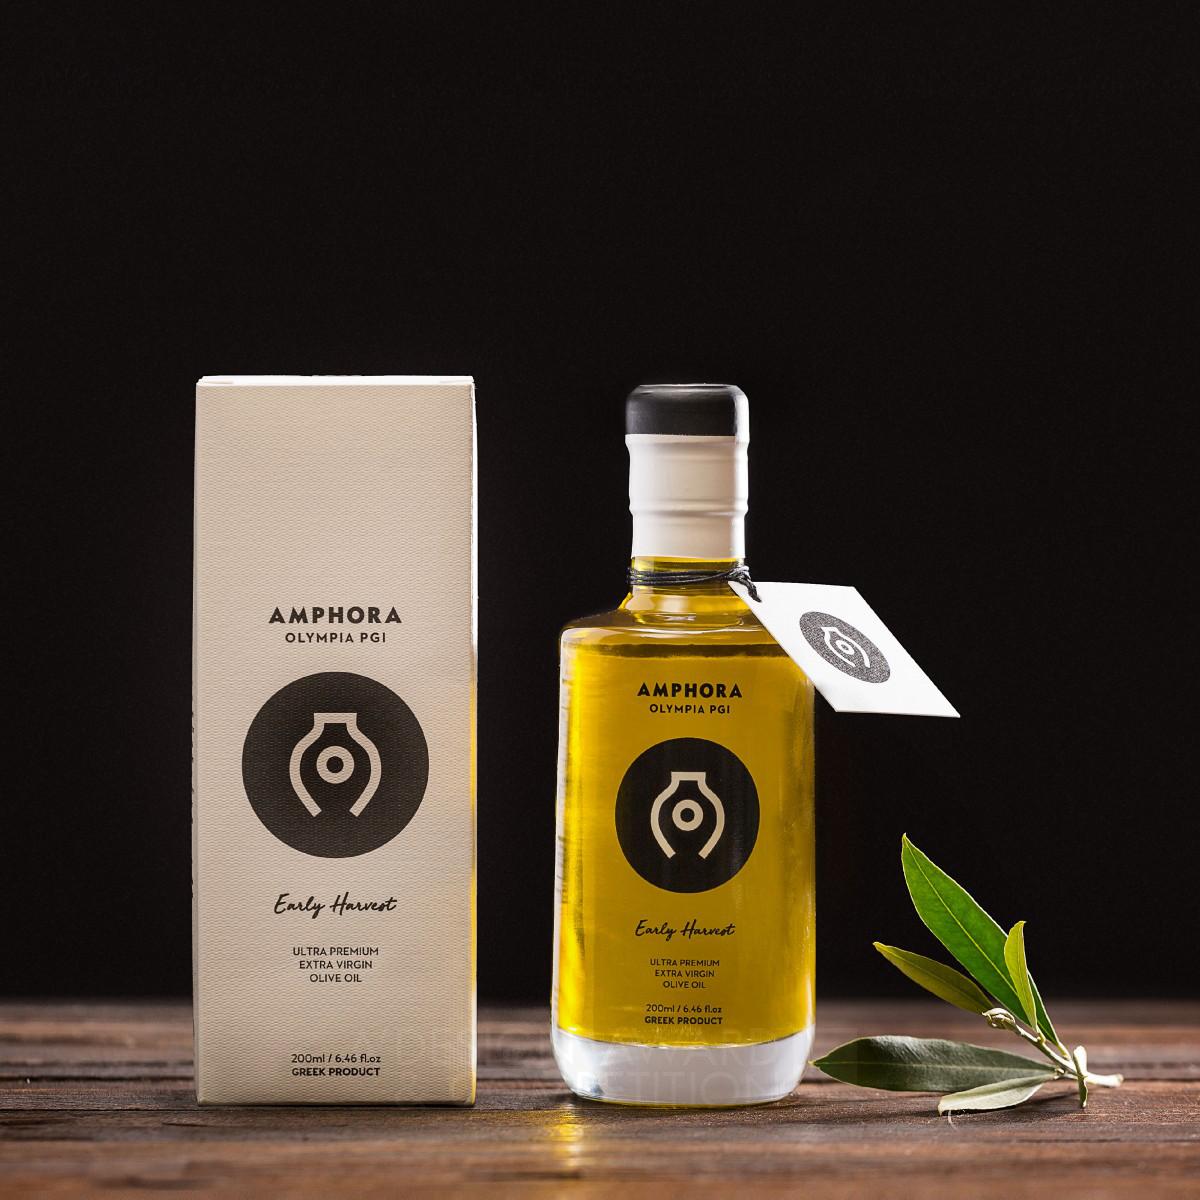 Amphora Olympia Extra Virgin Olive Oil